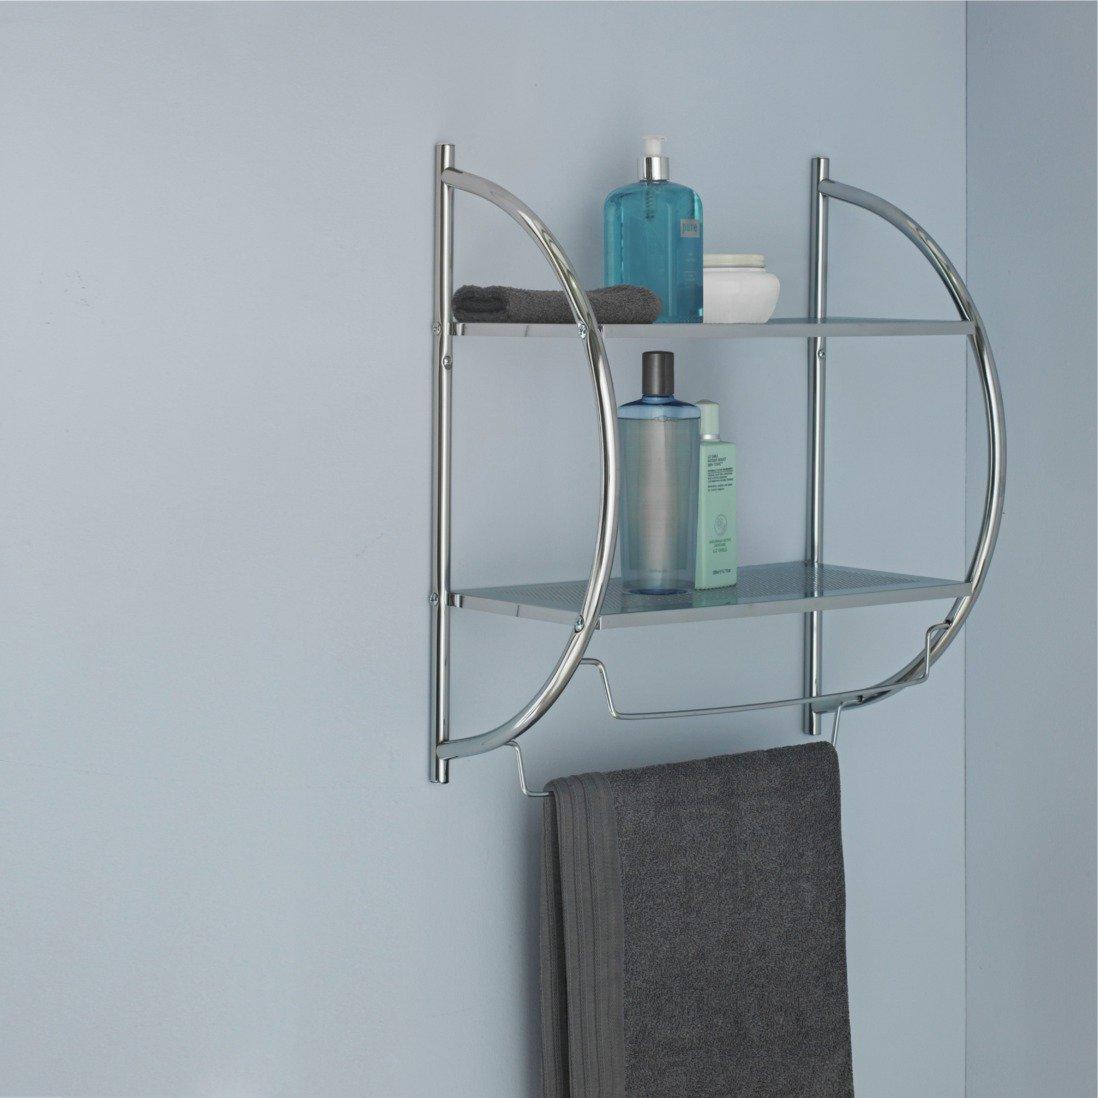 Collection Shelf and Towel Rail - Chrome